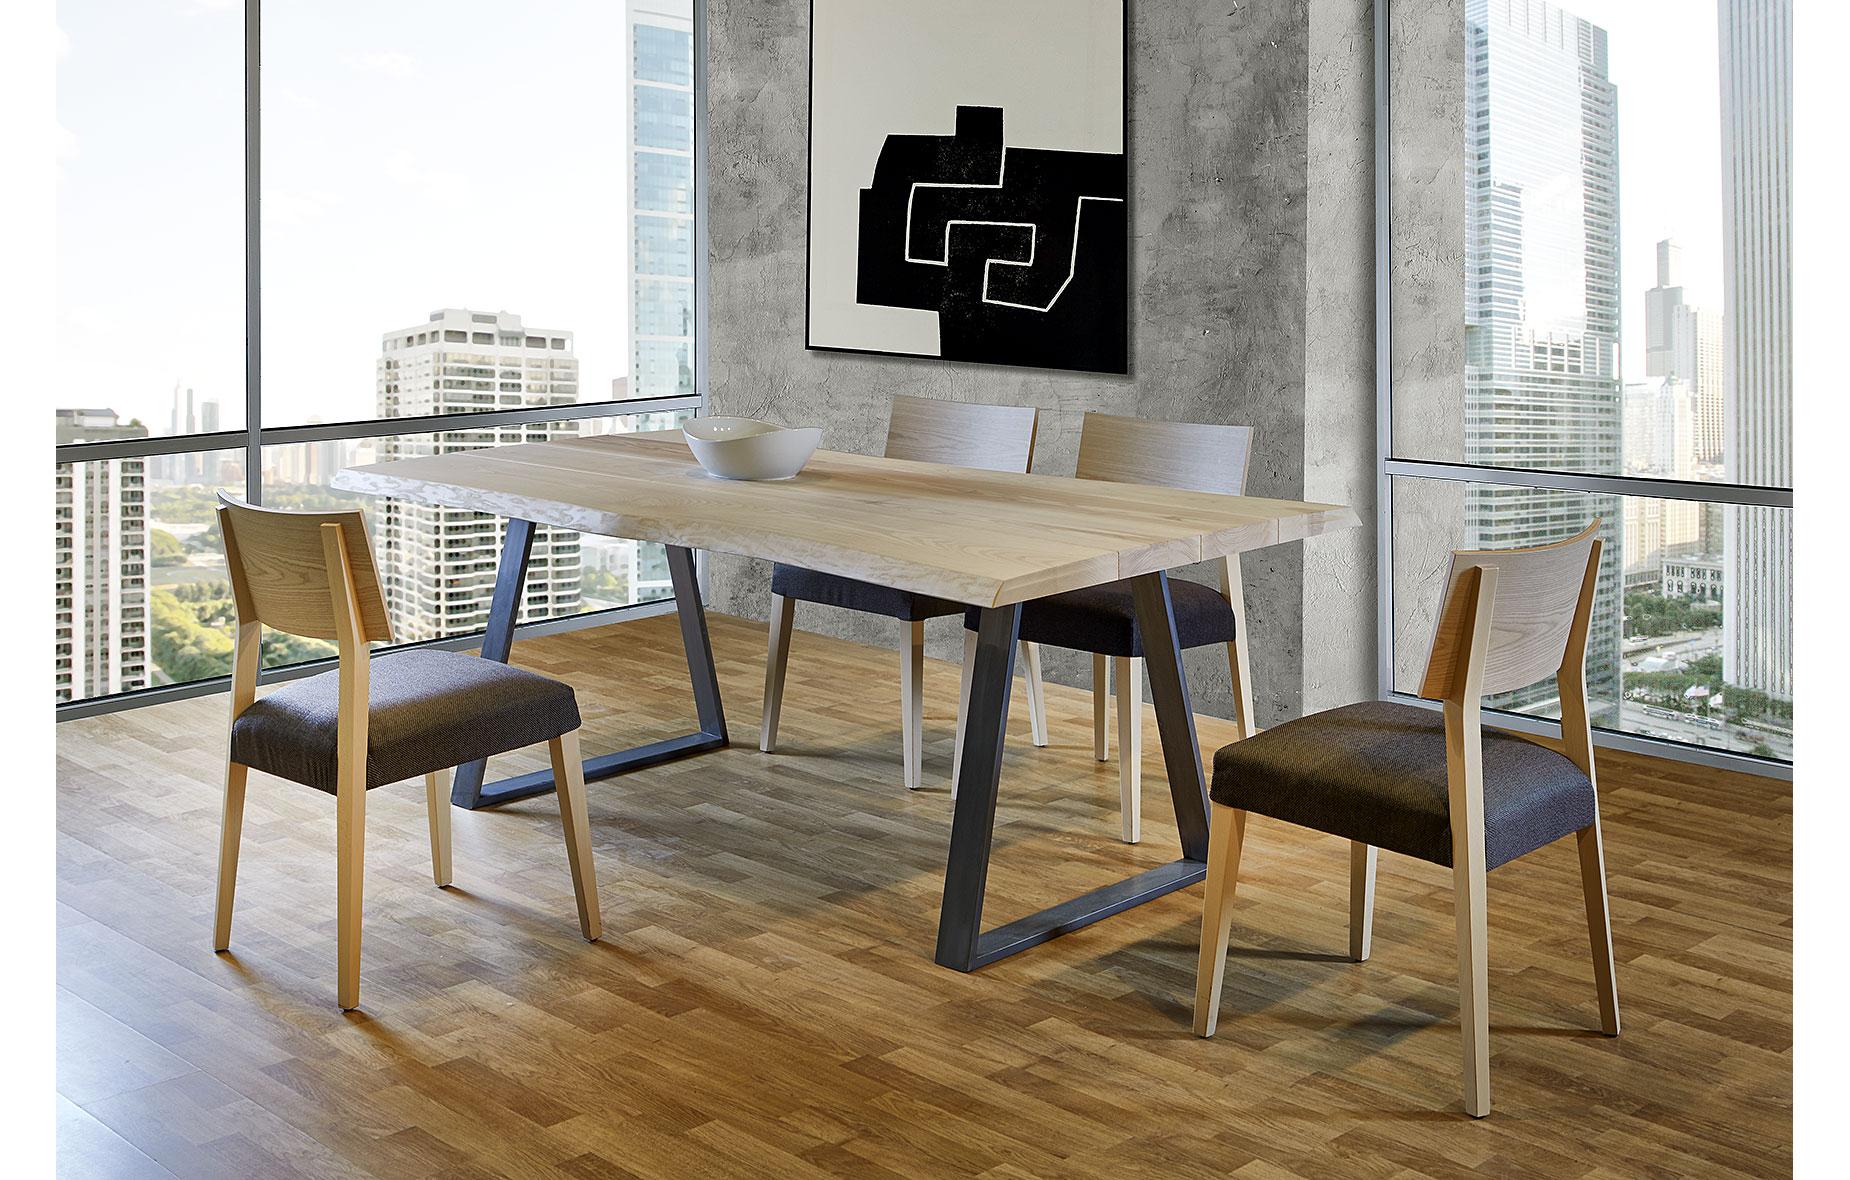 Muebles comedor industrial 20170815015234 for Muebles de comedor vintage